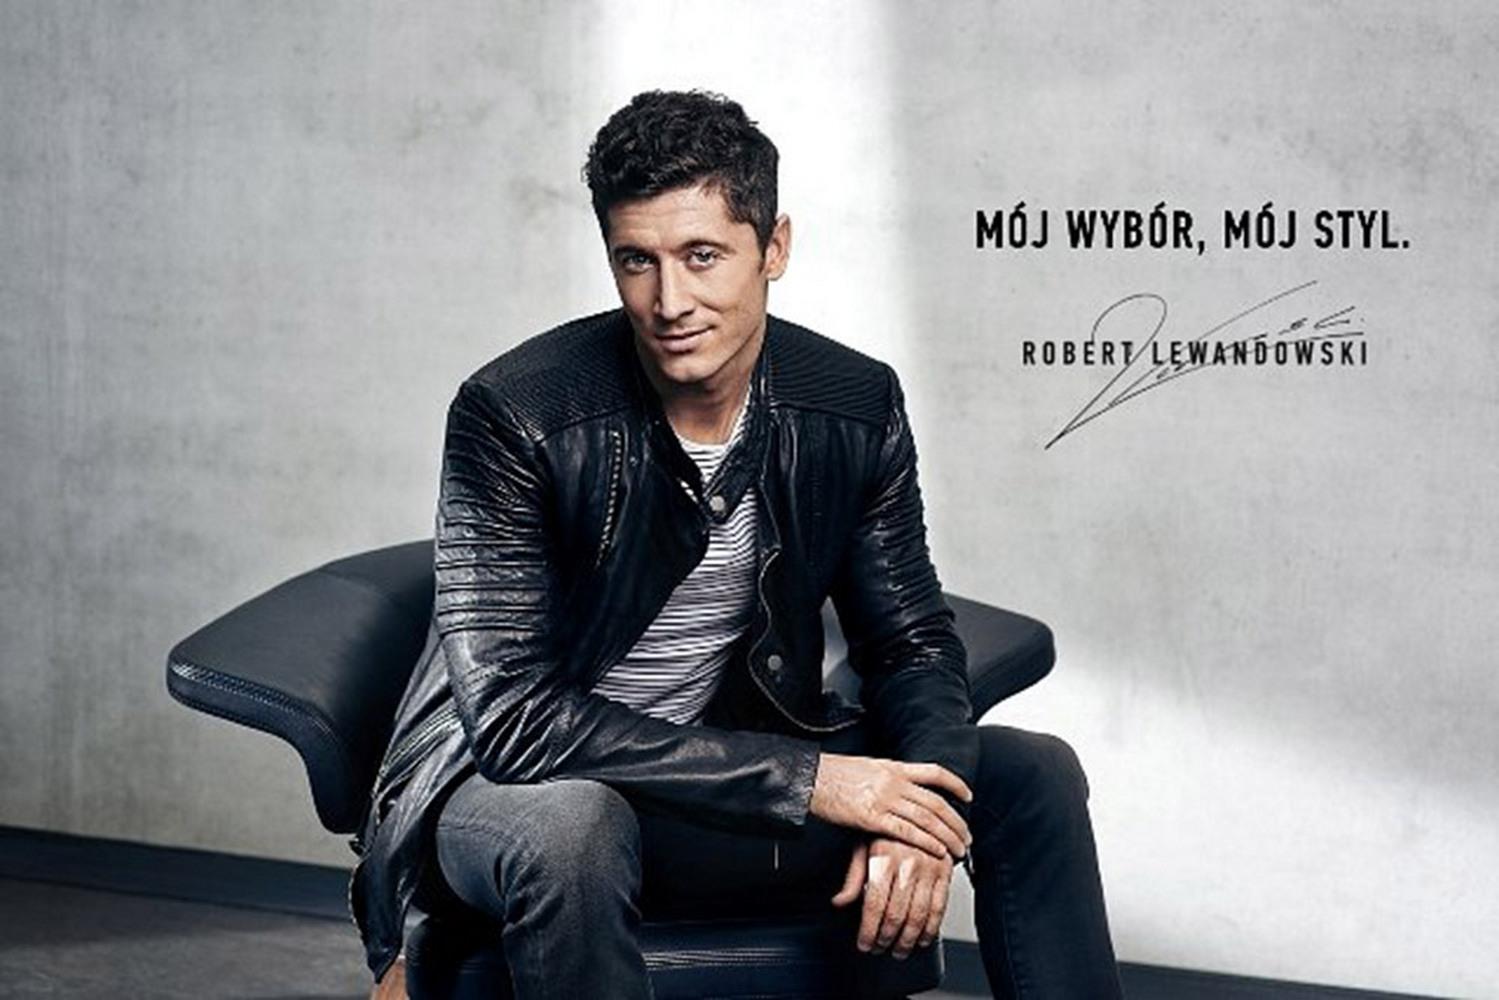 Za ile ubiera się Robert Lewandowski? - MrGentleman.pl